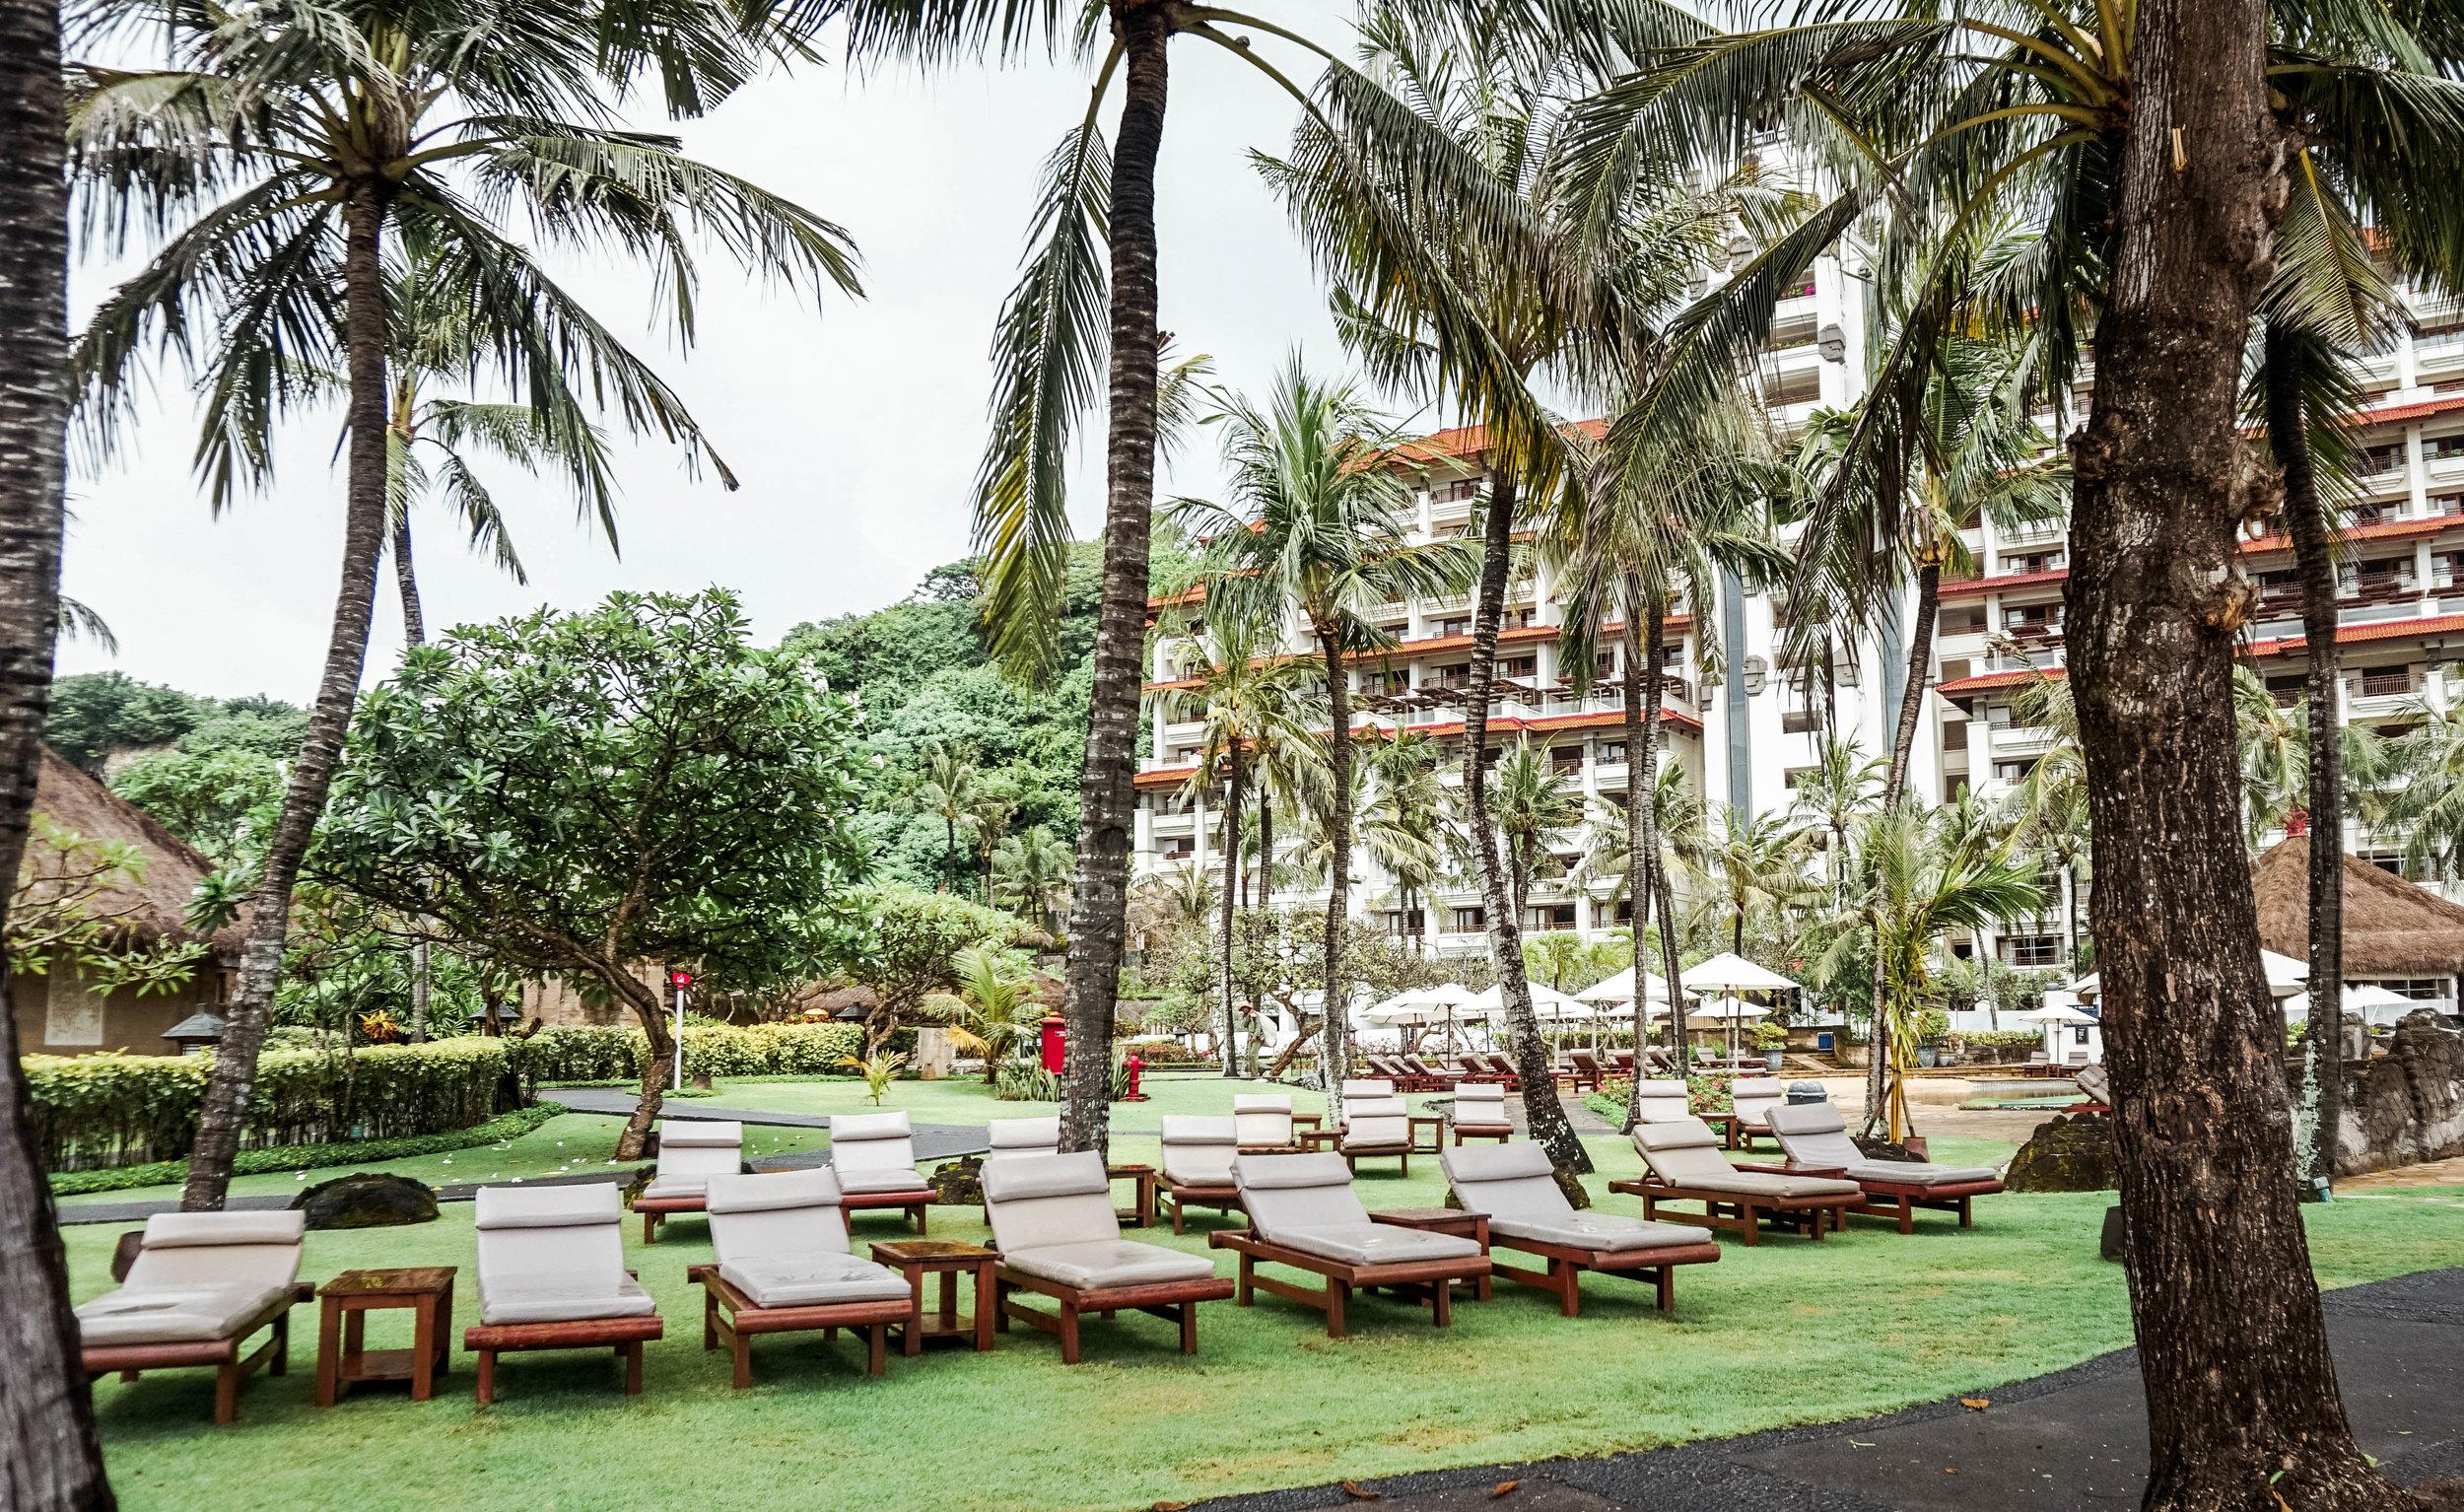 Hilton-bali-resort-grounds.jpg